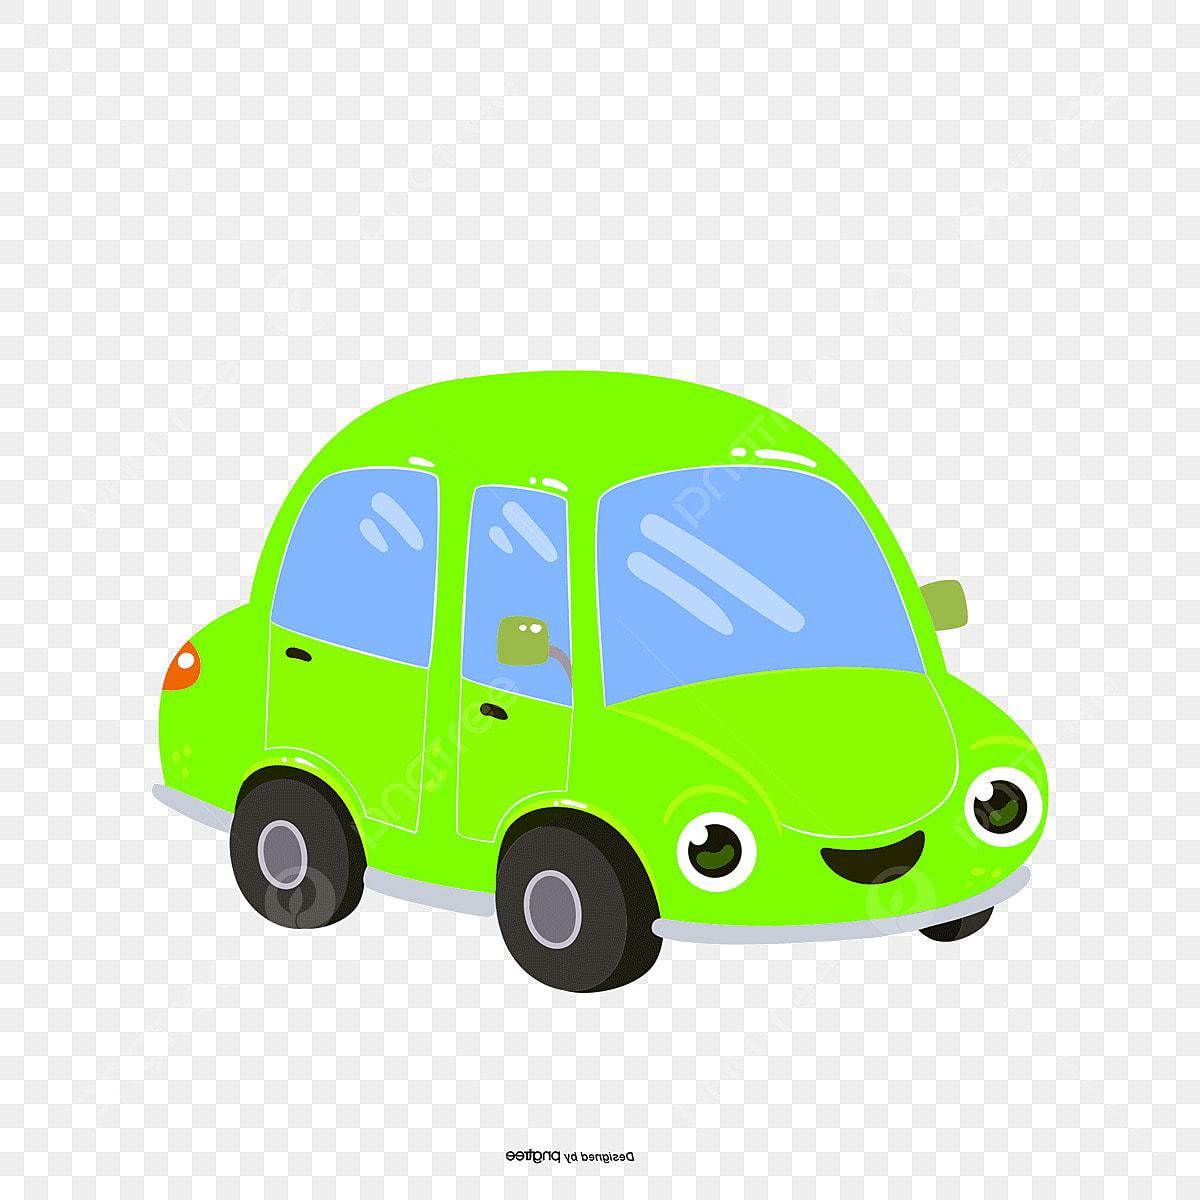 Png Vector Cartoon Car Material, Cartoon, Cartoon Vector, Creative